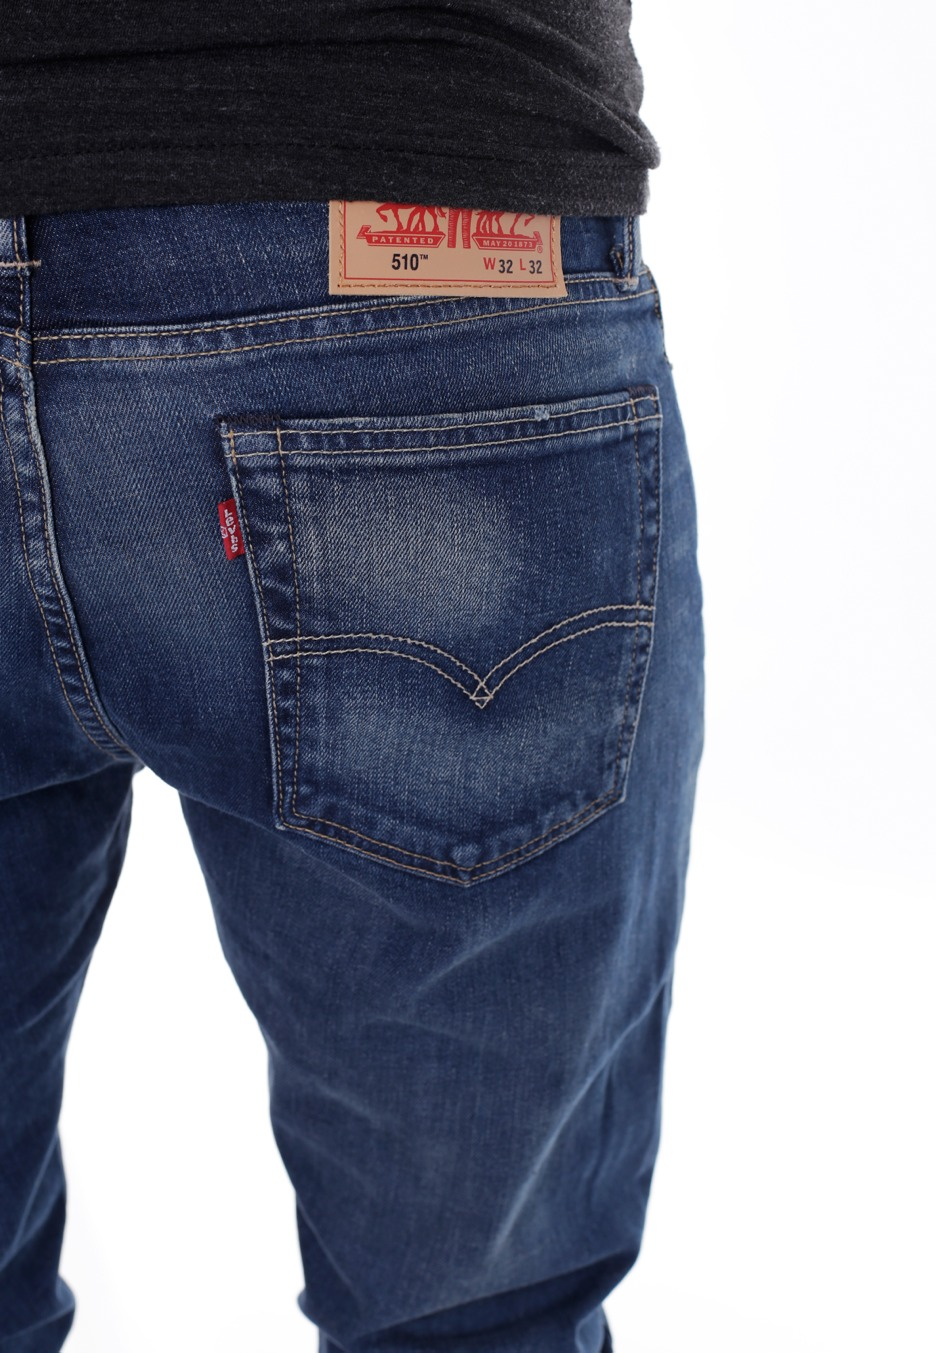 6a1794c65b68 Levi s - 510 Skinny Fit Blue Canyon - Jeans - Streetwear Shop ...